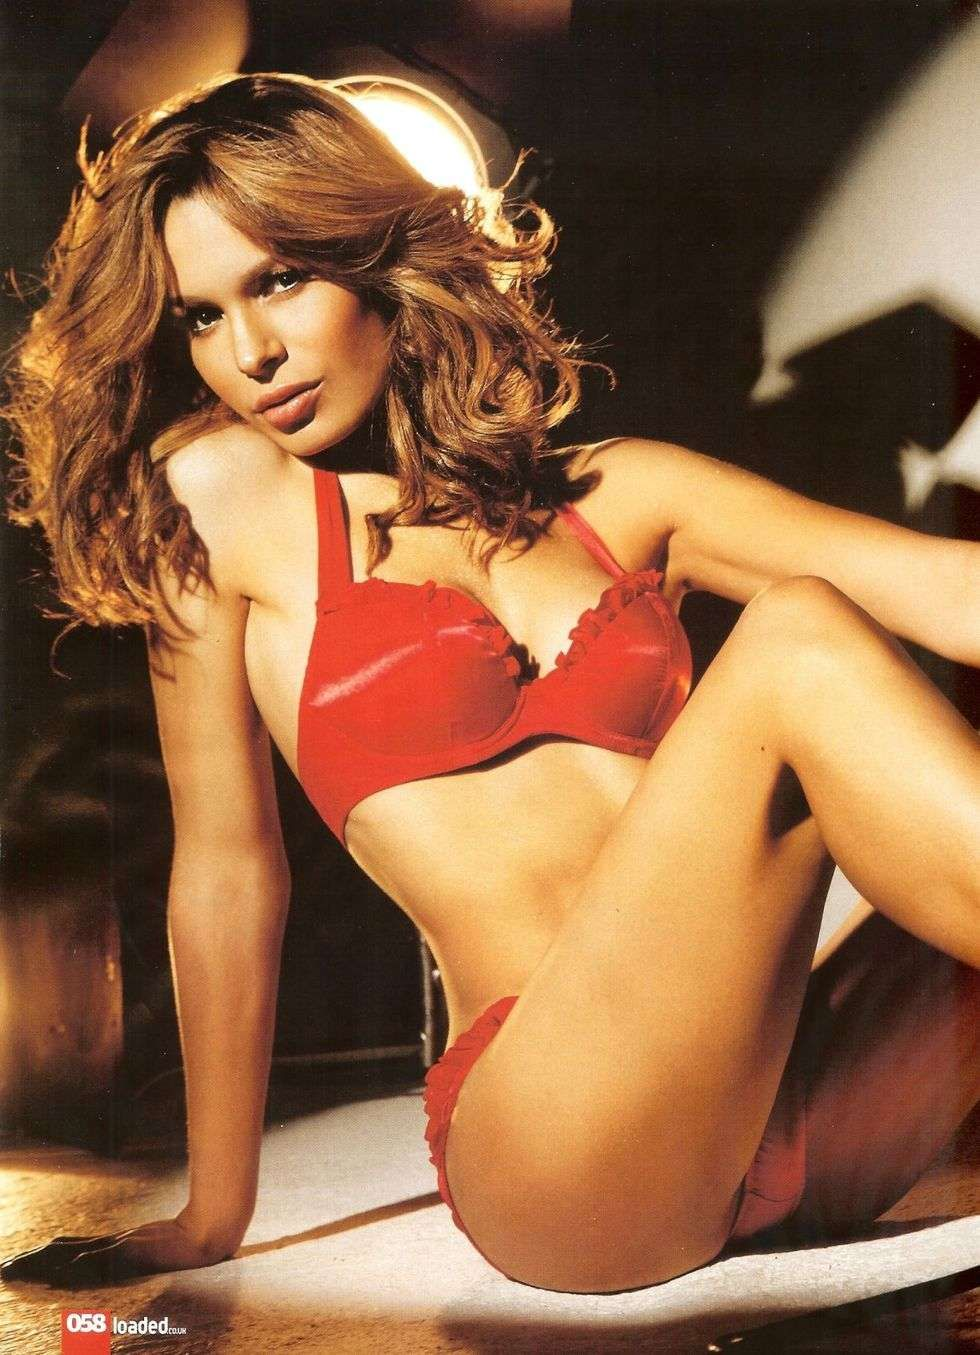 Selfie Nadine Velazquez nudes (49 photos), Ass, Leaked, Selfie, braless 2006